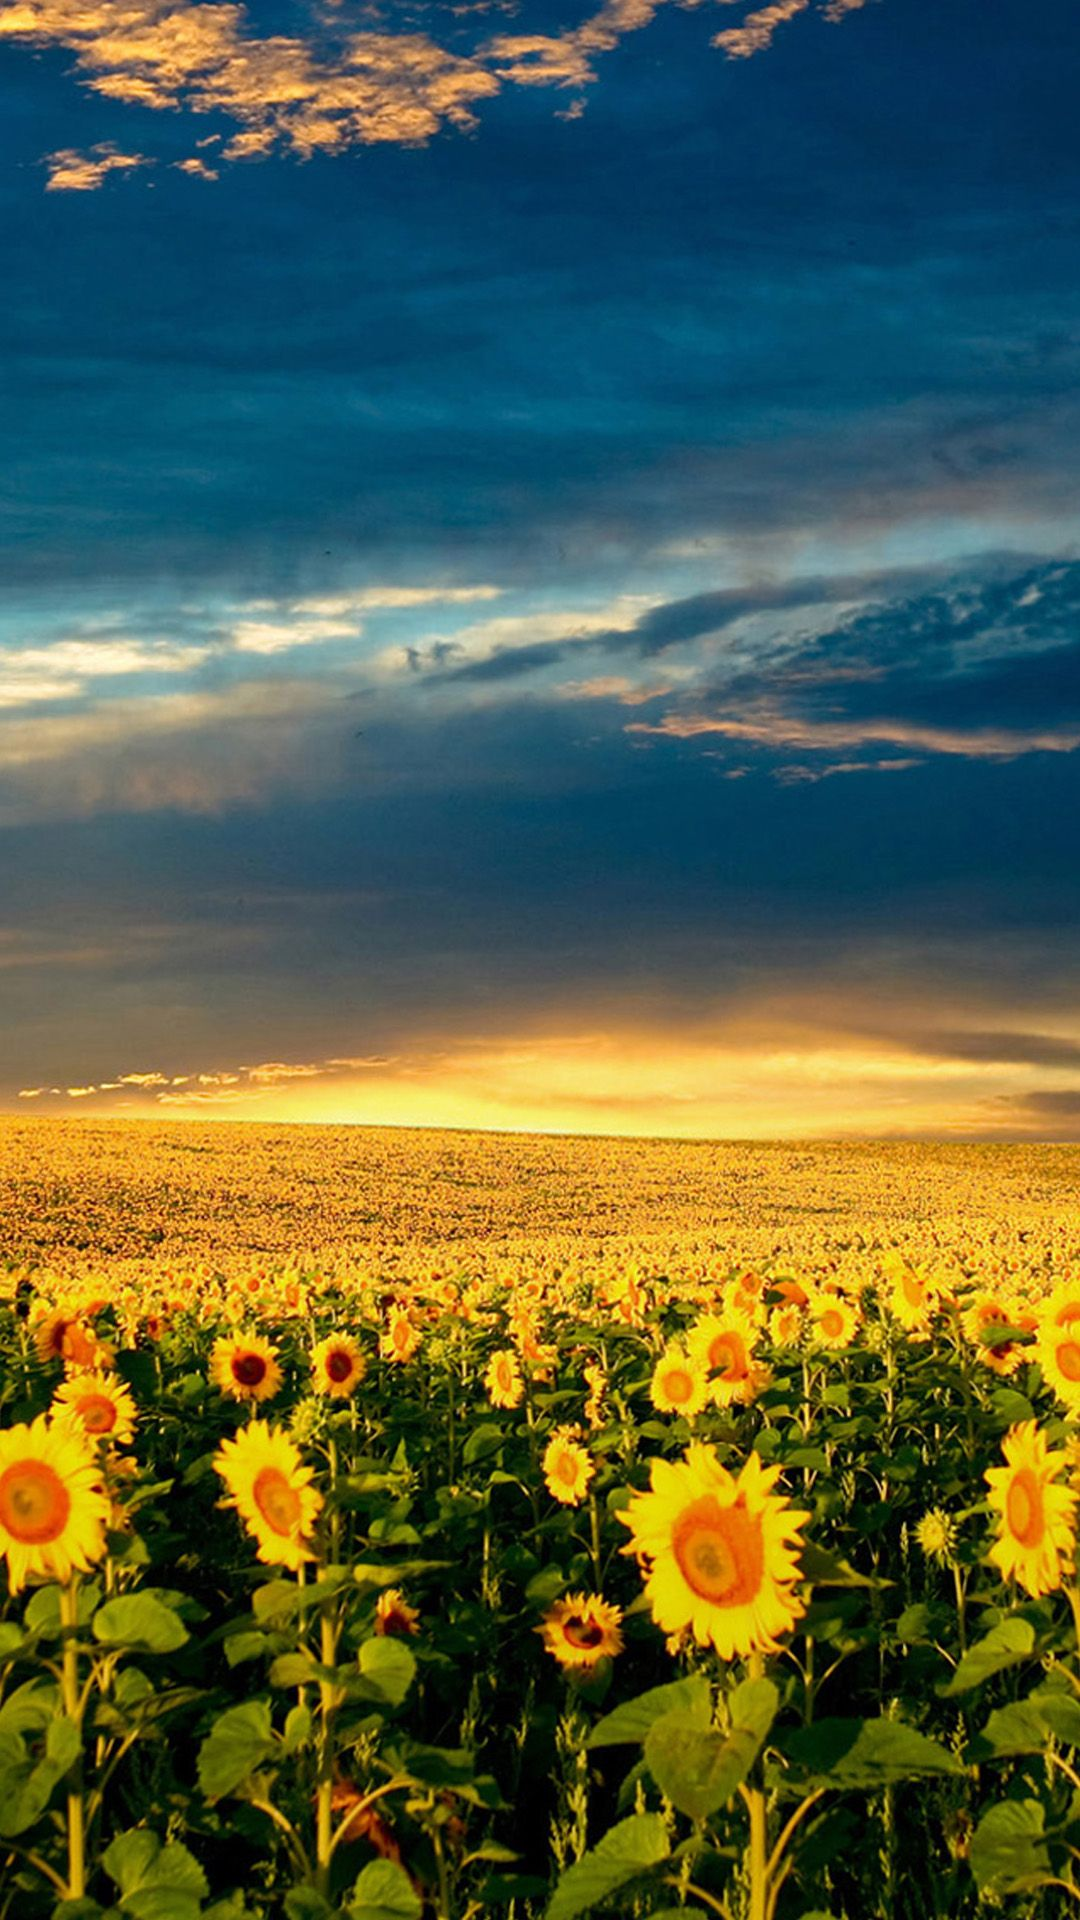 Nature Splendid Vast Sunflower Field IPhone 6 Wallpaper